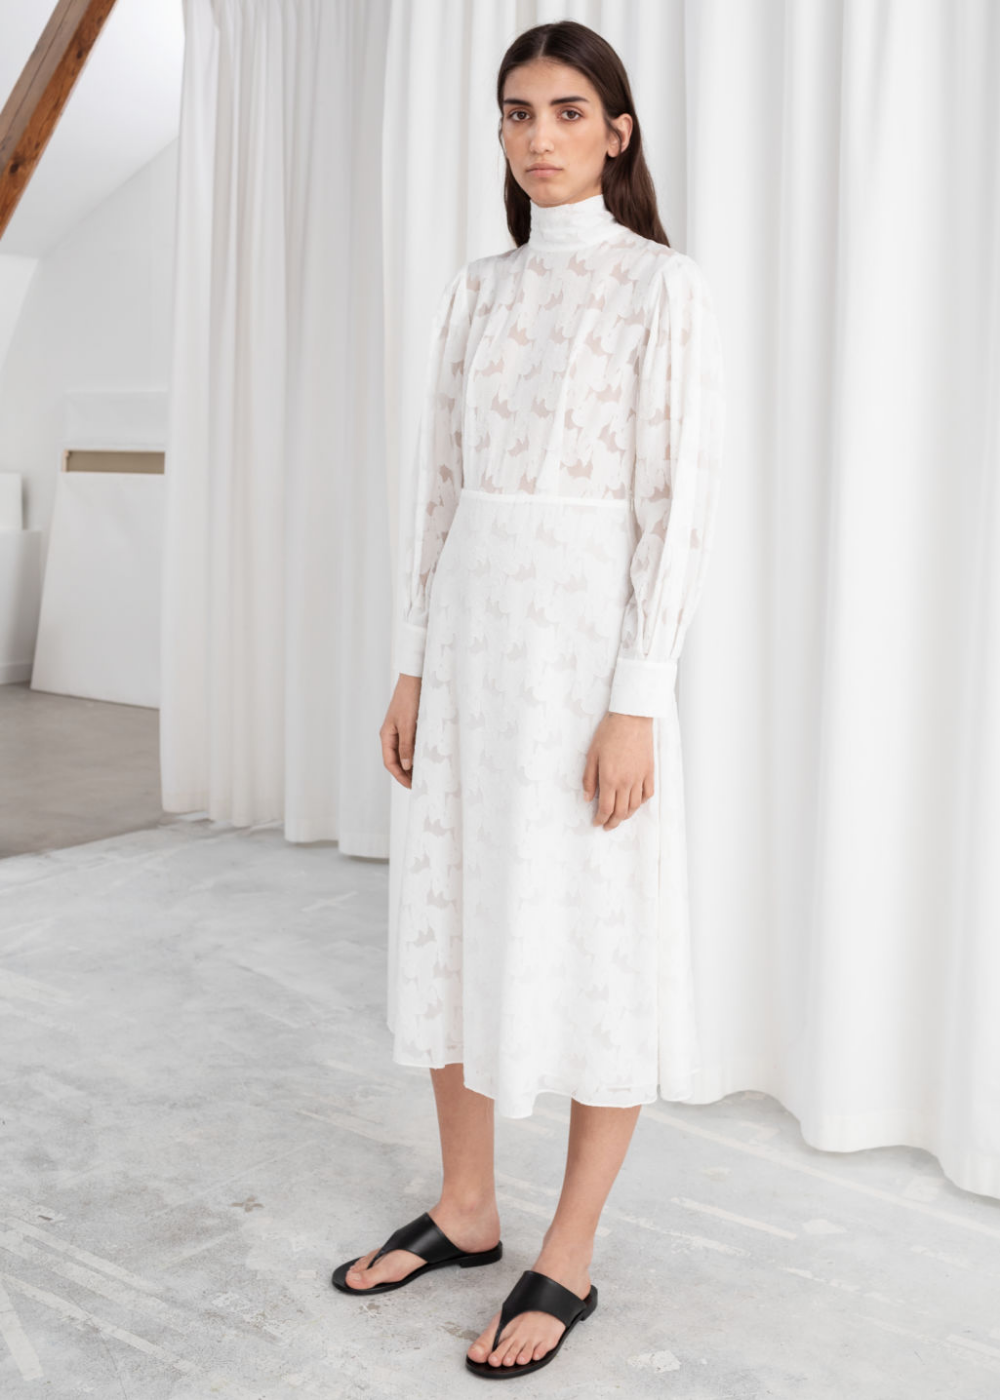 Turtleneck Jacquard Dress Jacquard Dress Dresses Turtleneck Wedding Dress [ 1400 x 1000 Pixel ]